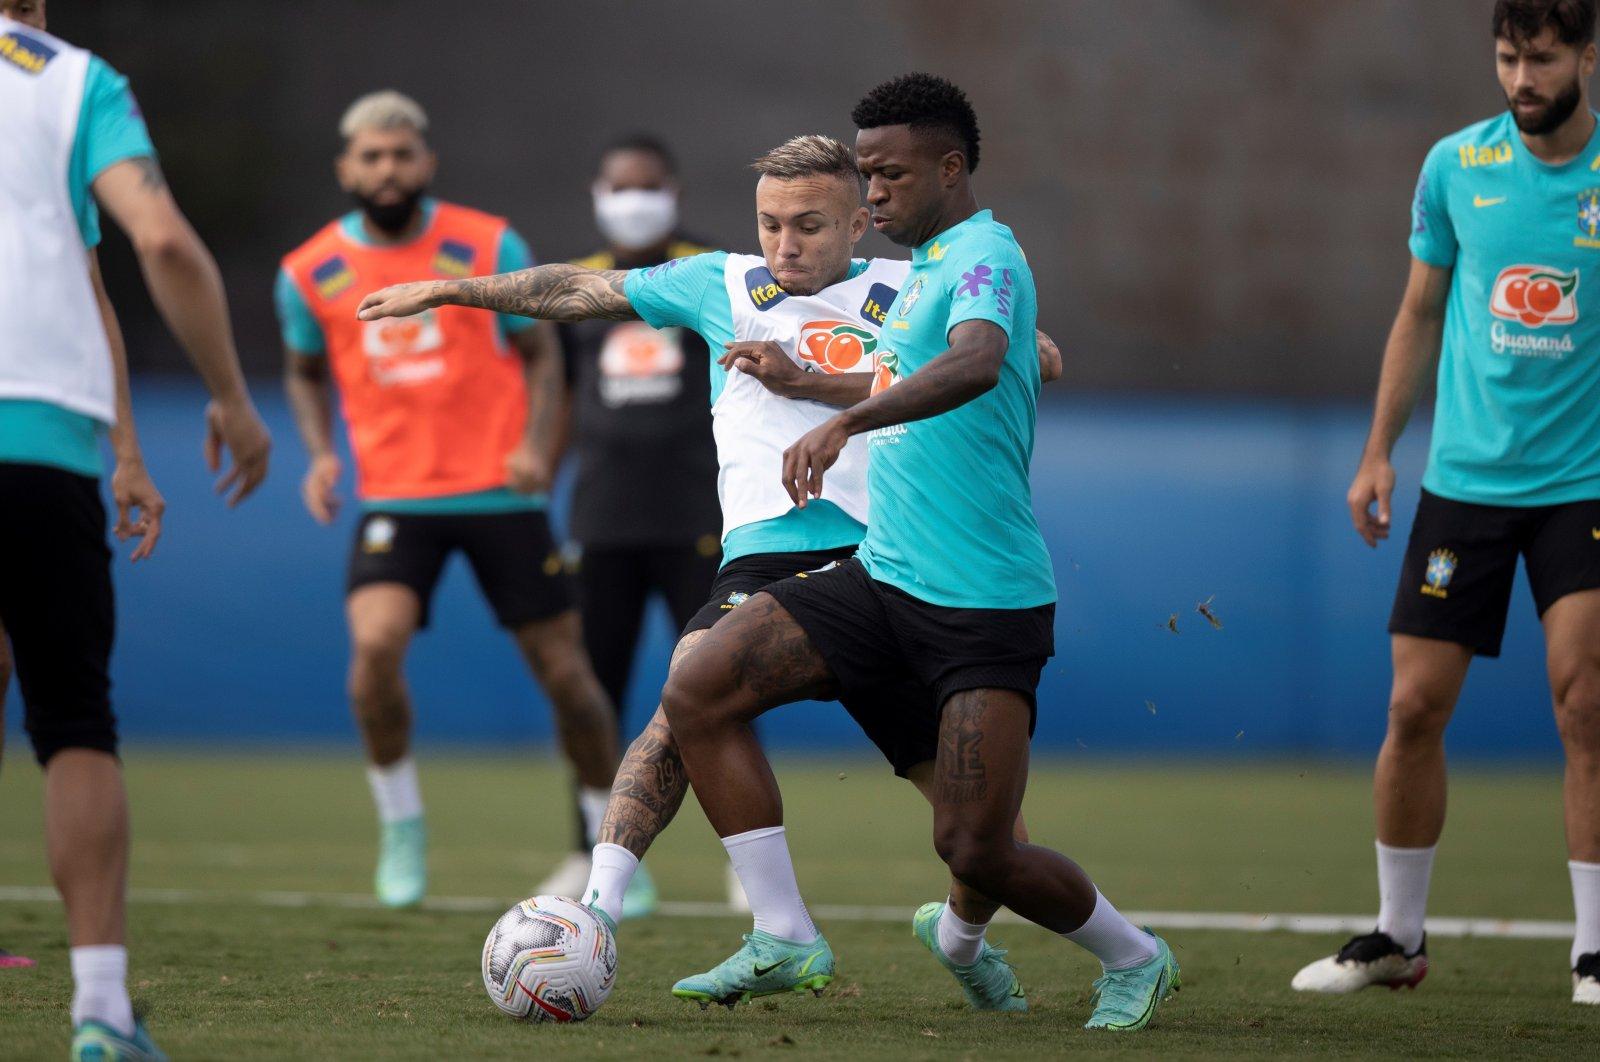 Brazilian national team players Vinicius Junior (2nd R) and Everton participate in a training session in Brasilia, Brazil, June 14, 2021. (EPA Photo)